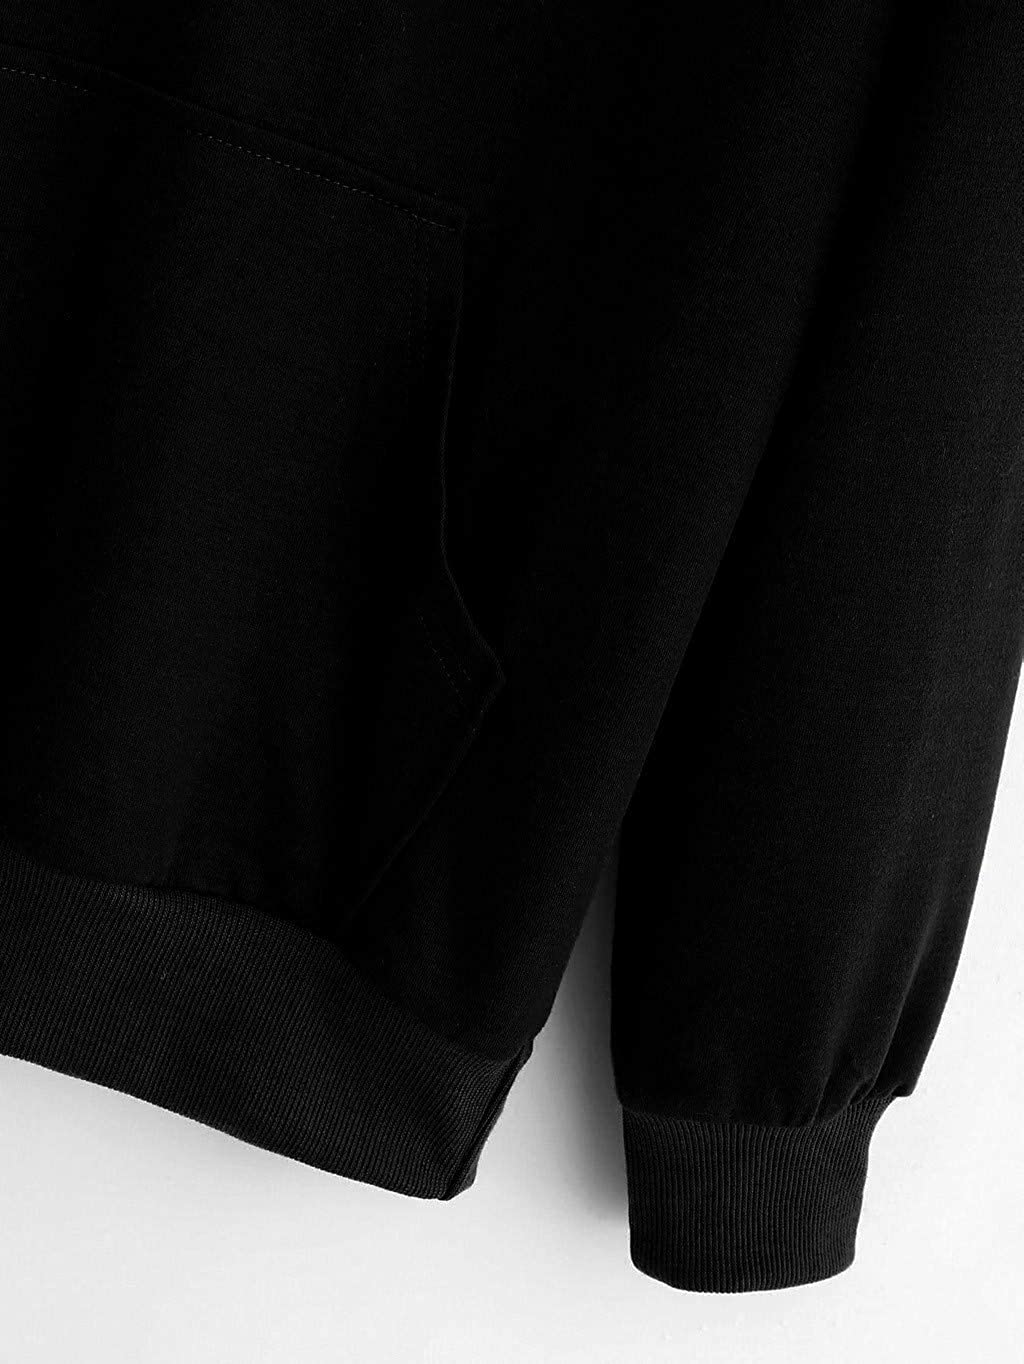 MIRRAY Damen Katzenohren Long /Ärmel Hoodie Sweatshirt mit Kapuze Pullover Tops Bluse